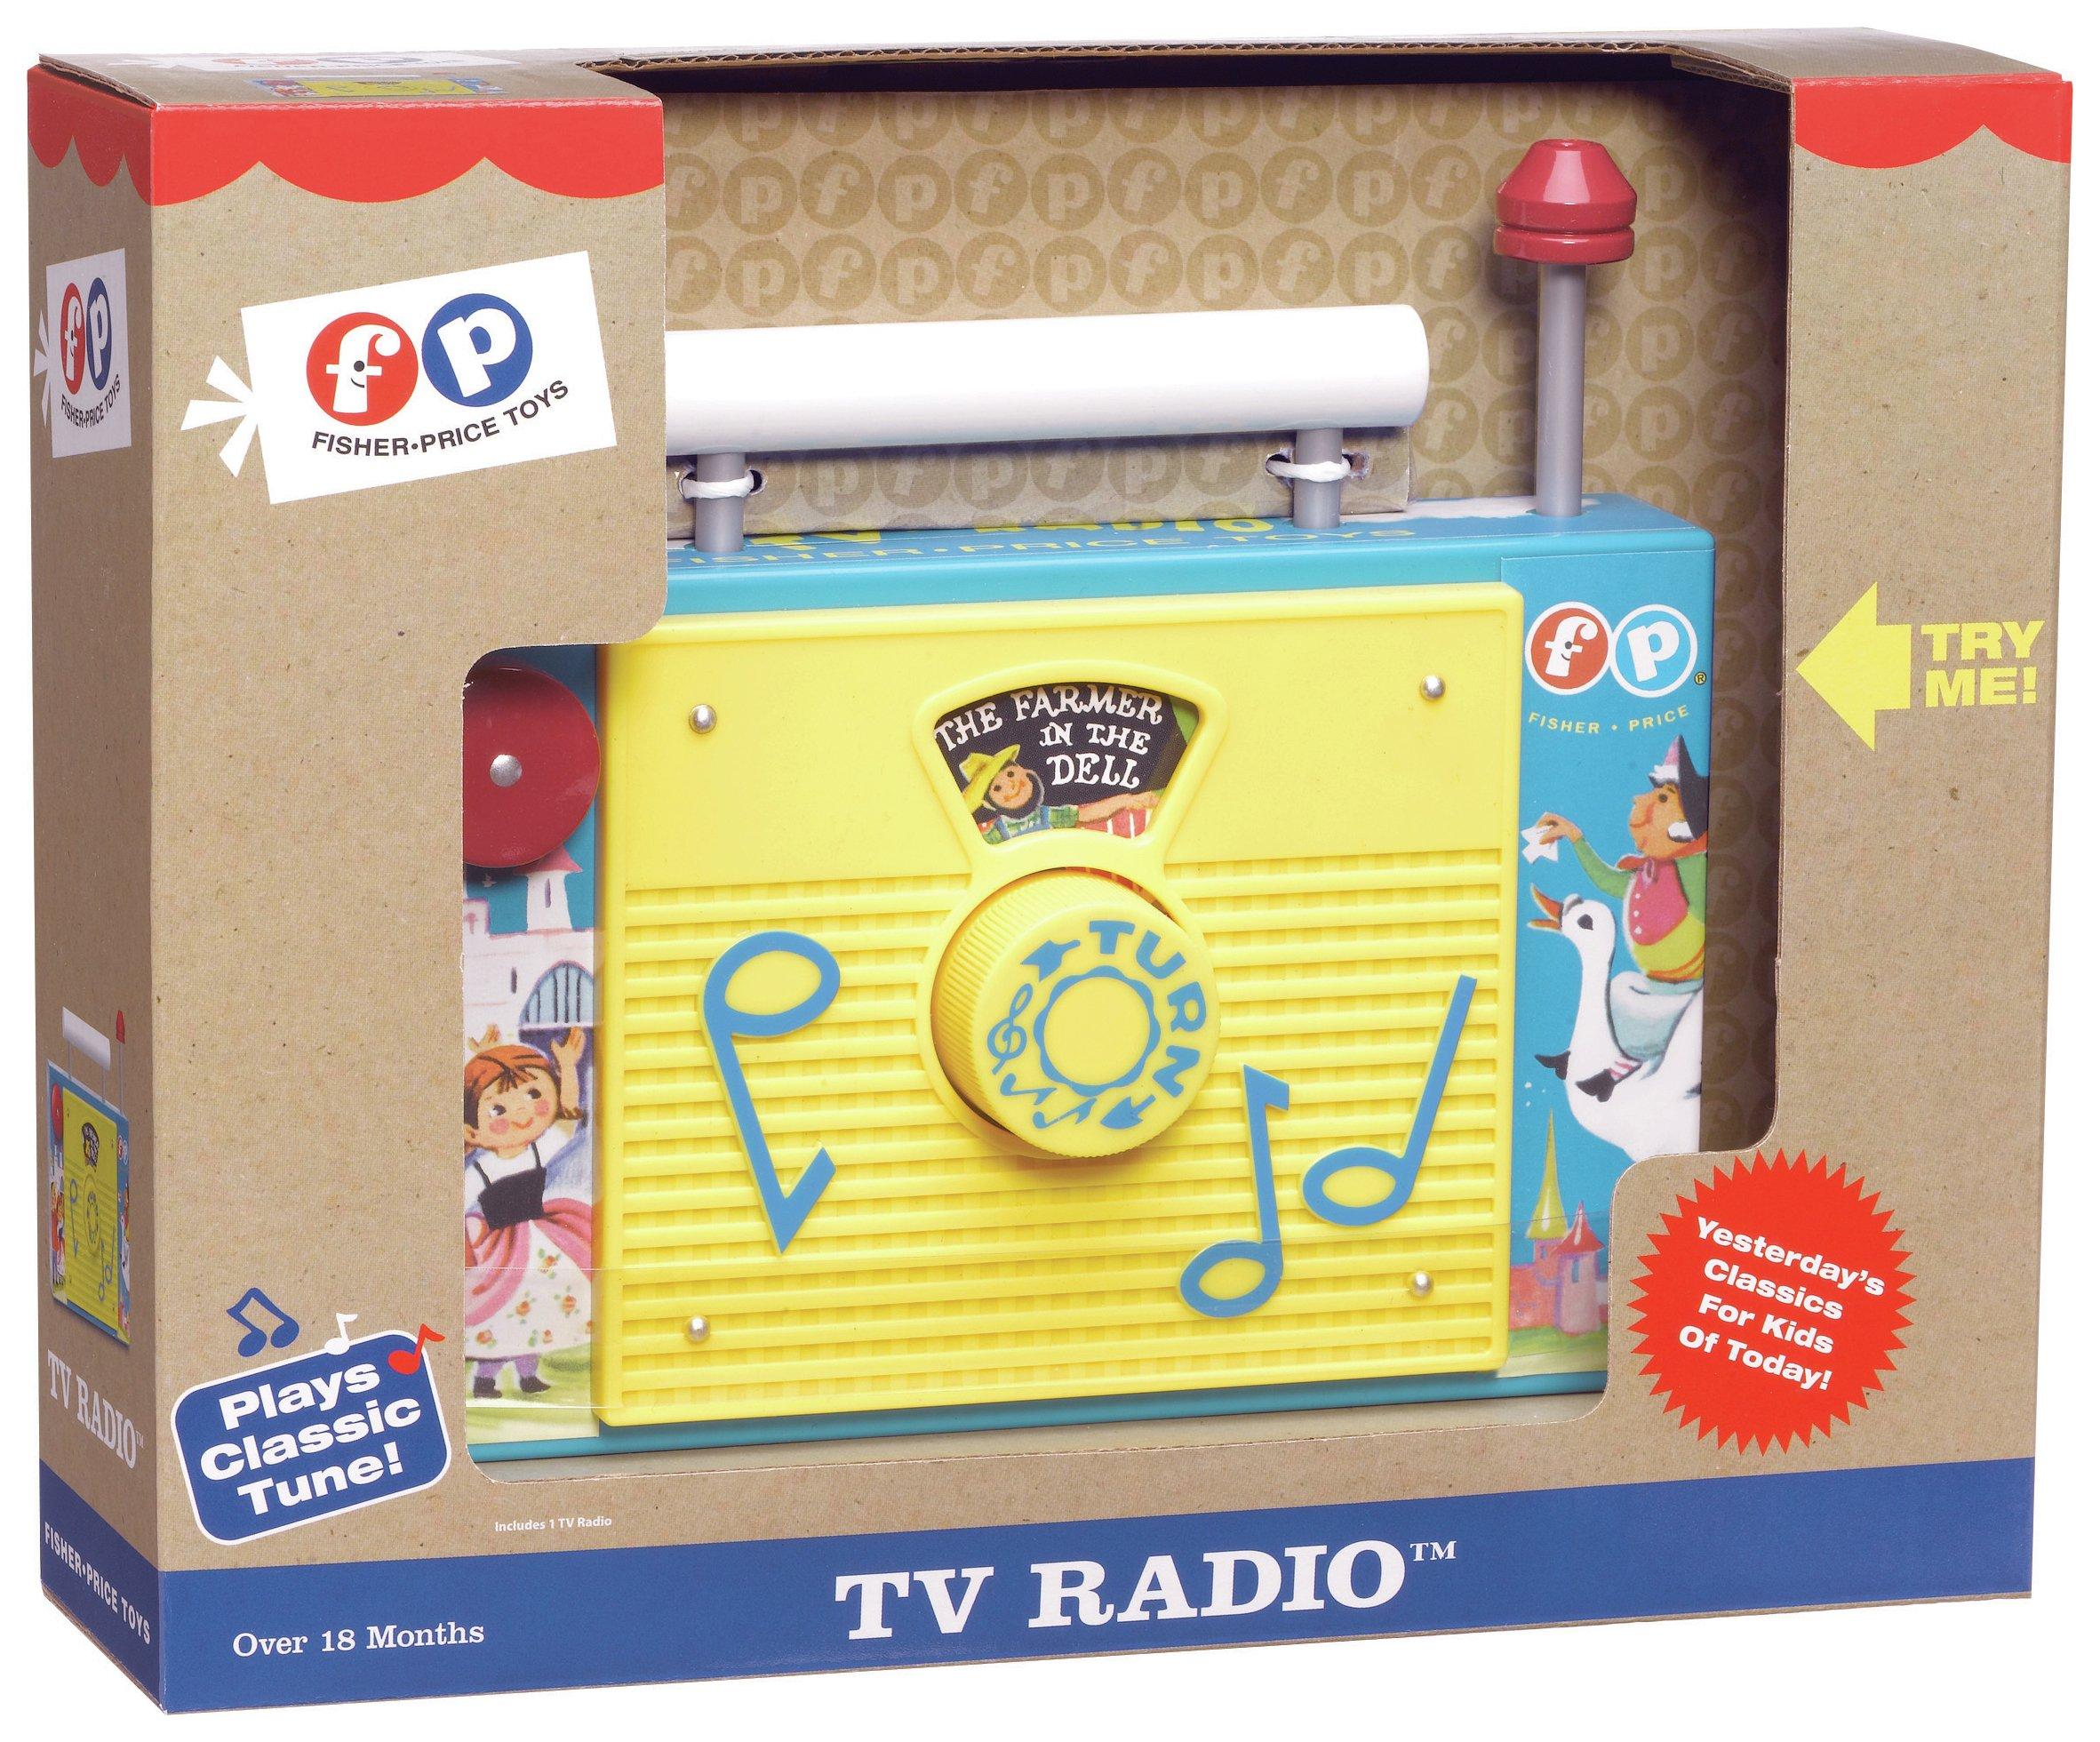 Fisher Price - Classics TV Radio - Game.